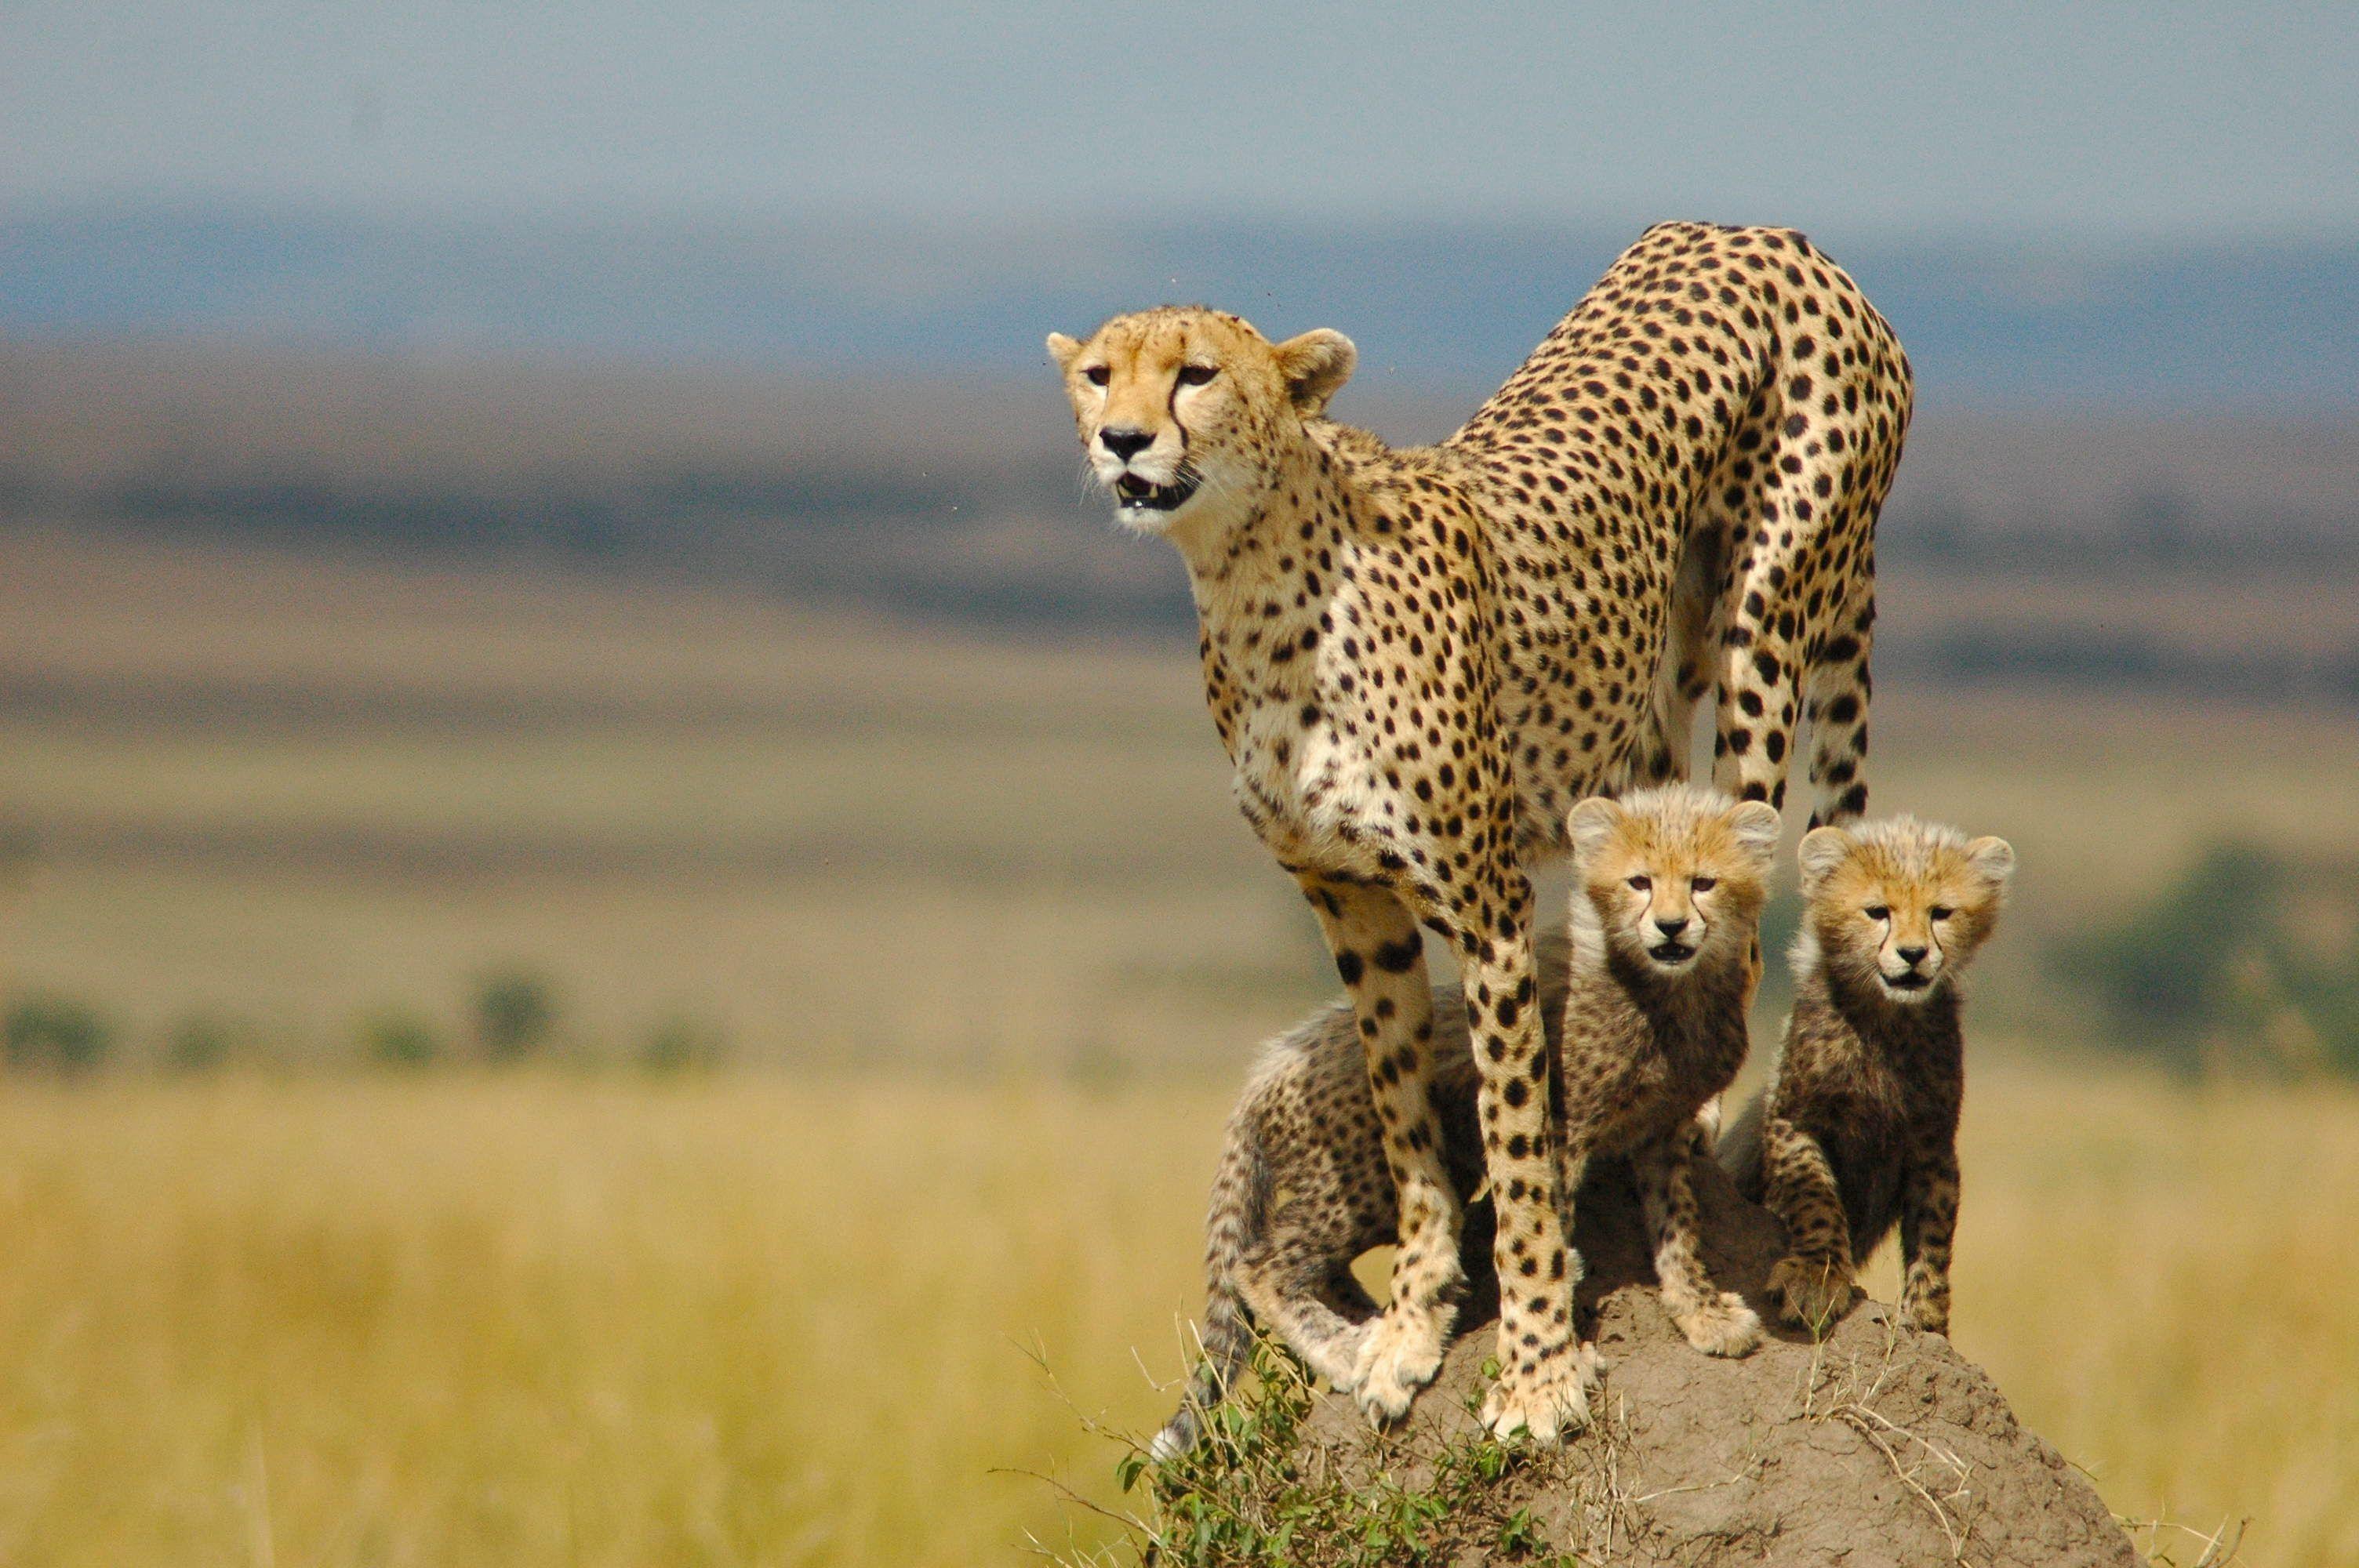 1080p Cheetah Wallpaper Hd